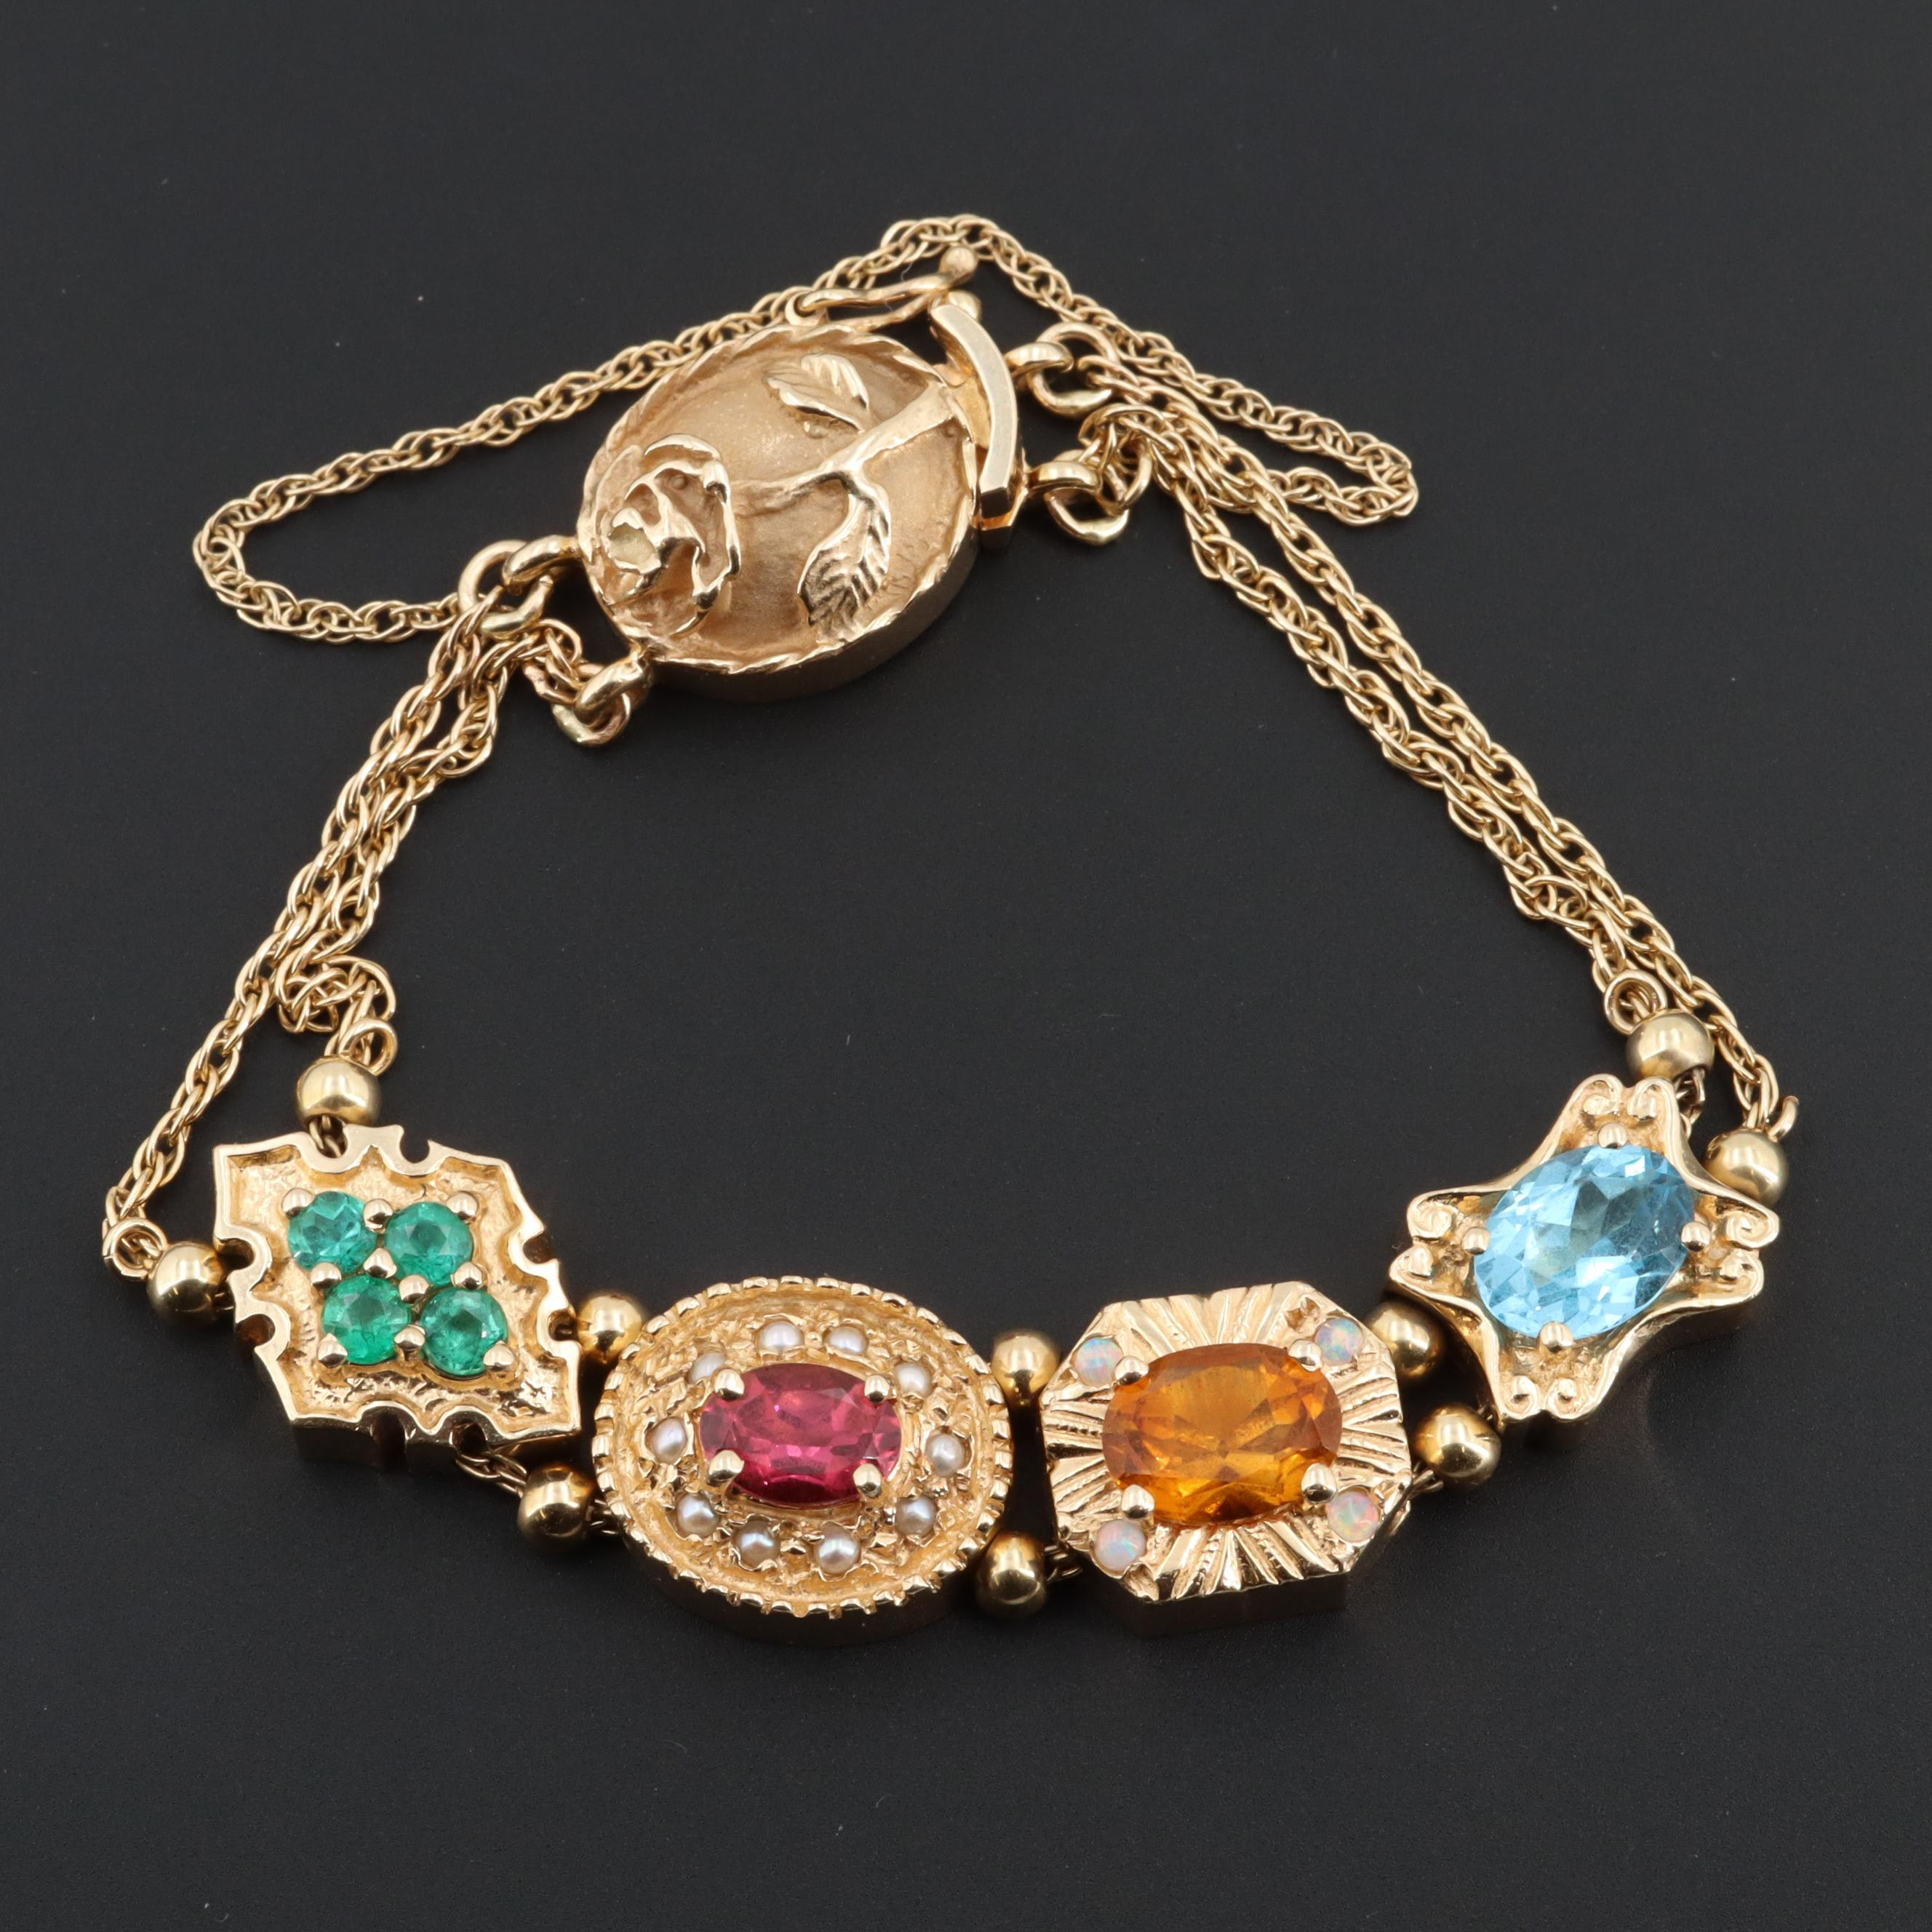 Goldman Kolber 14K Gold Mixed Gemstone Slide Charm Bracelet with Seed Pearls